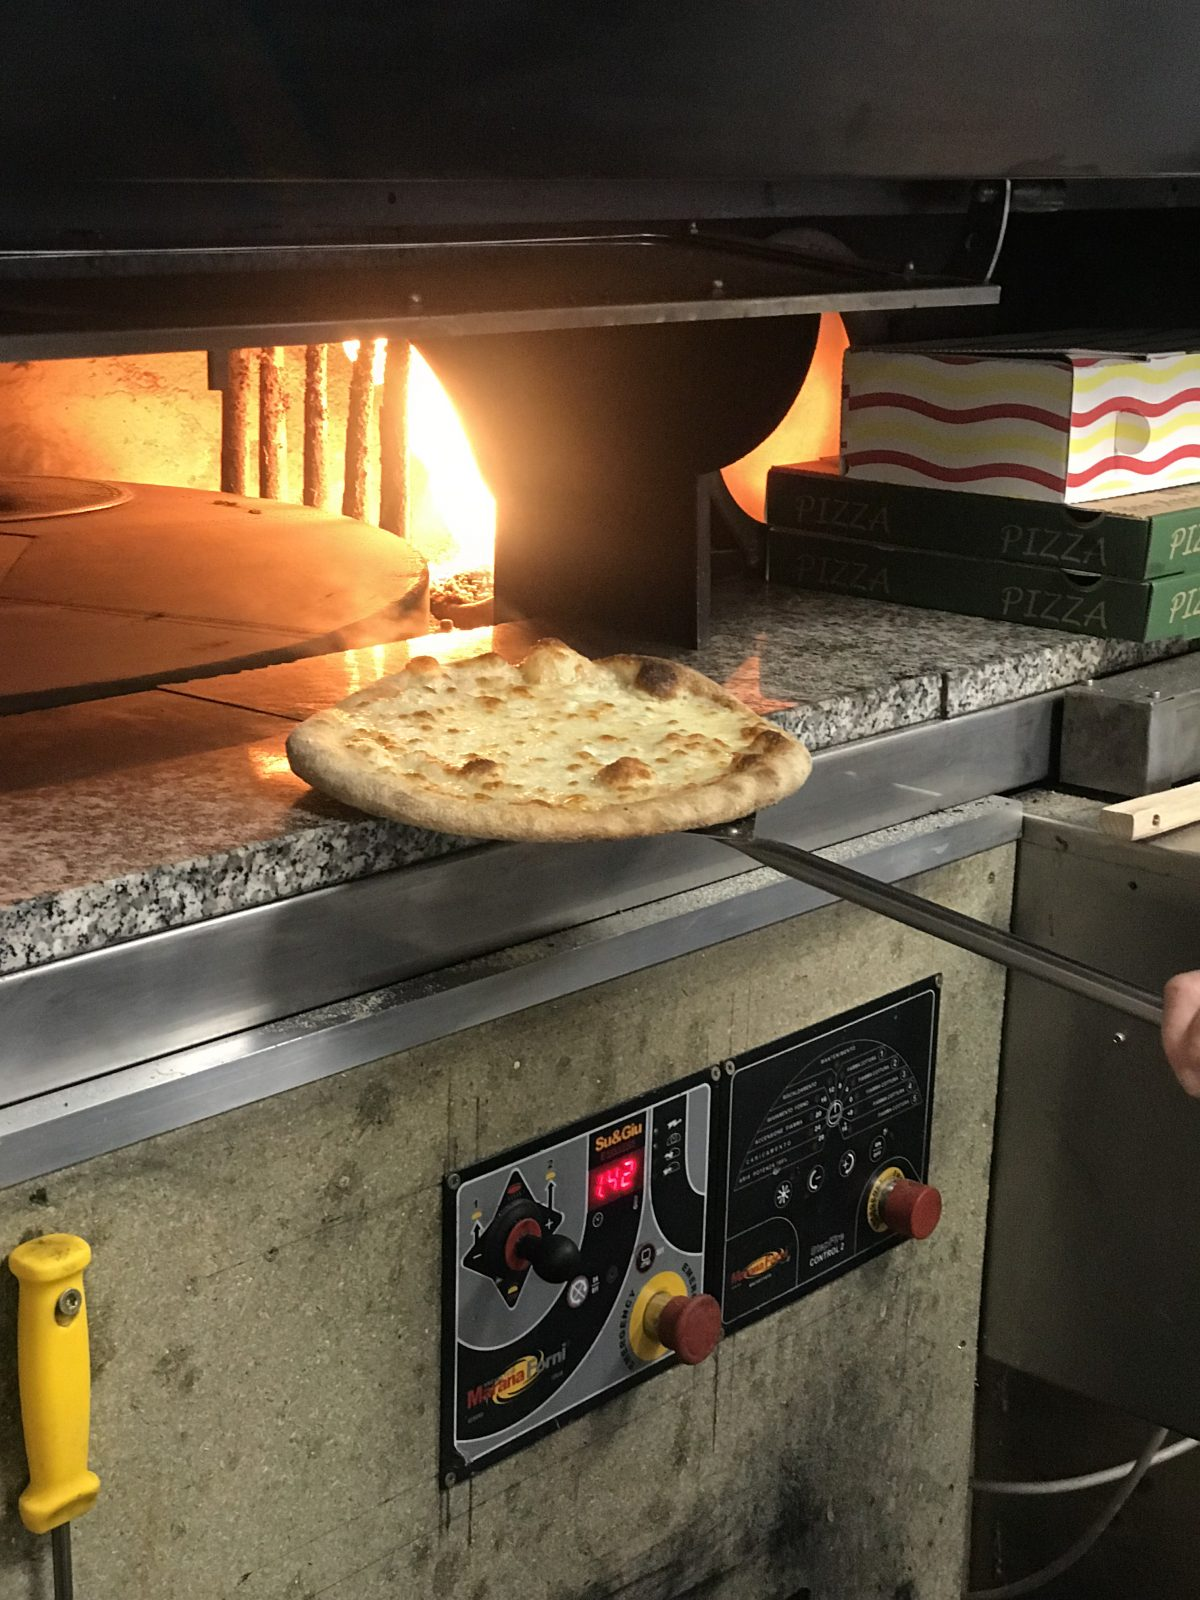 Pizzeria à l'imprévu